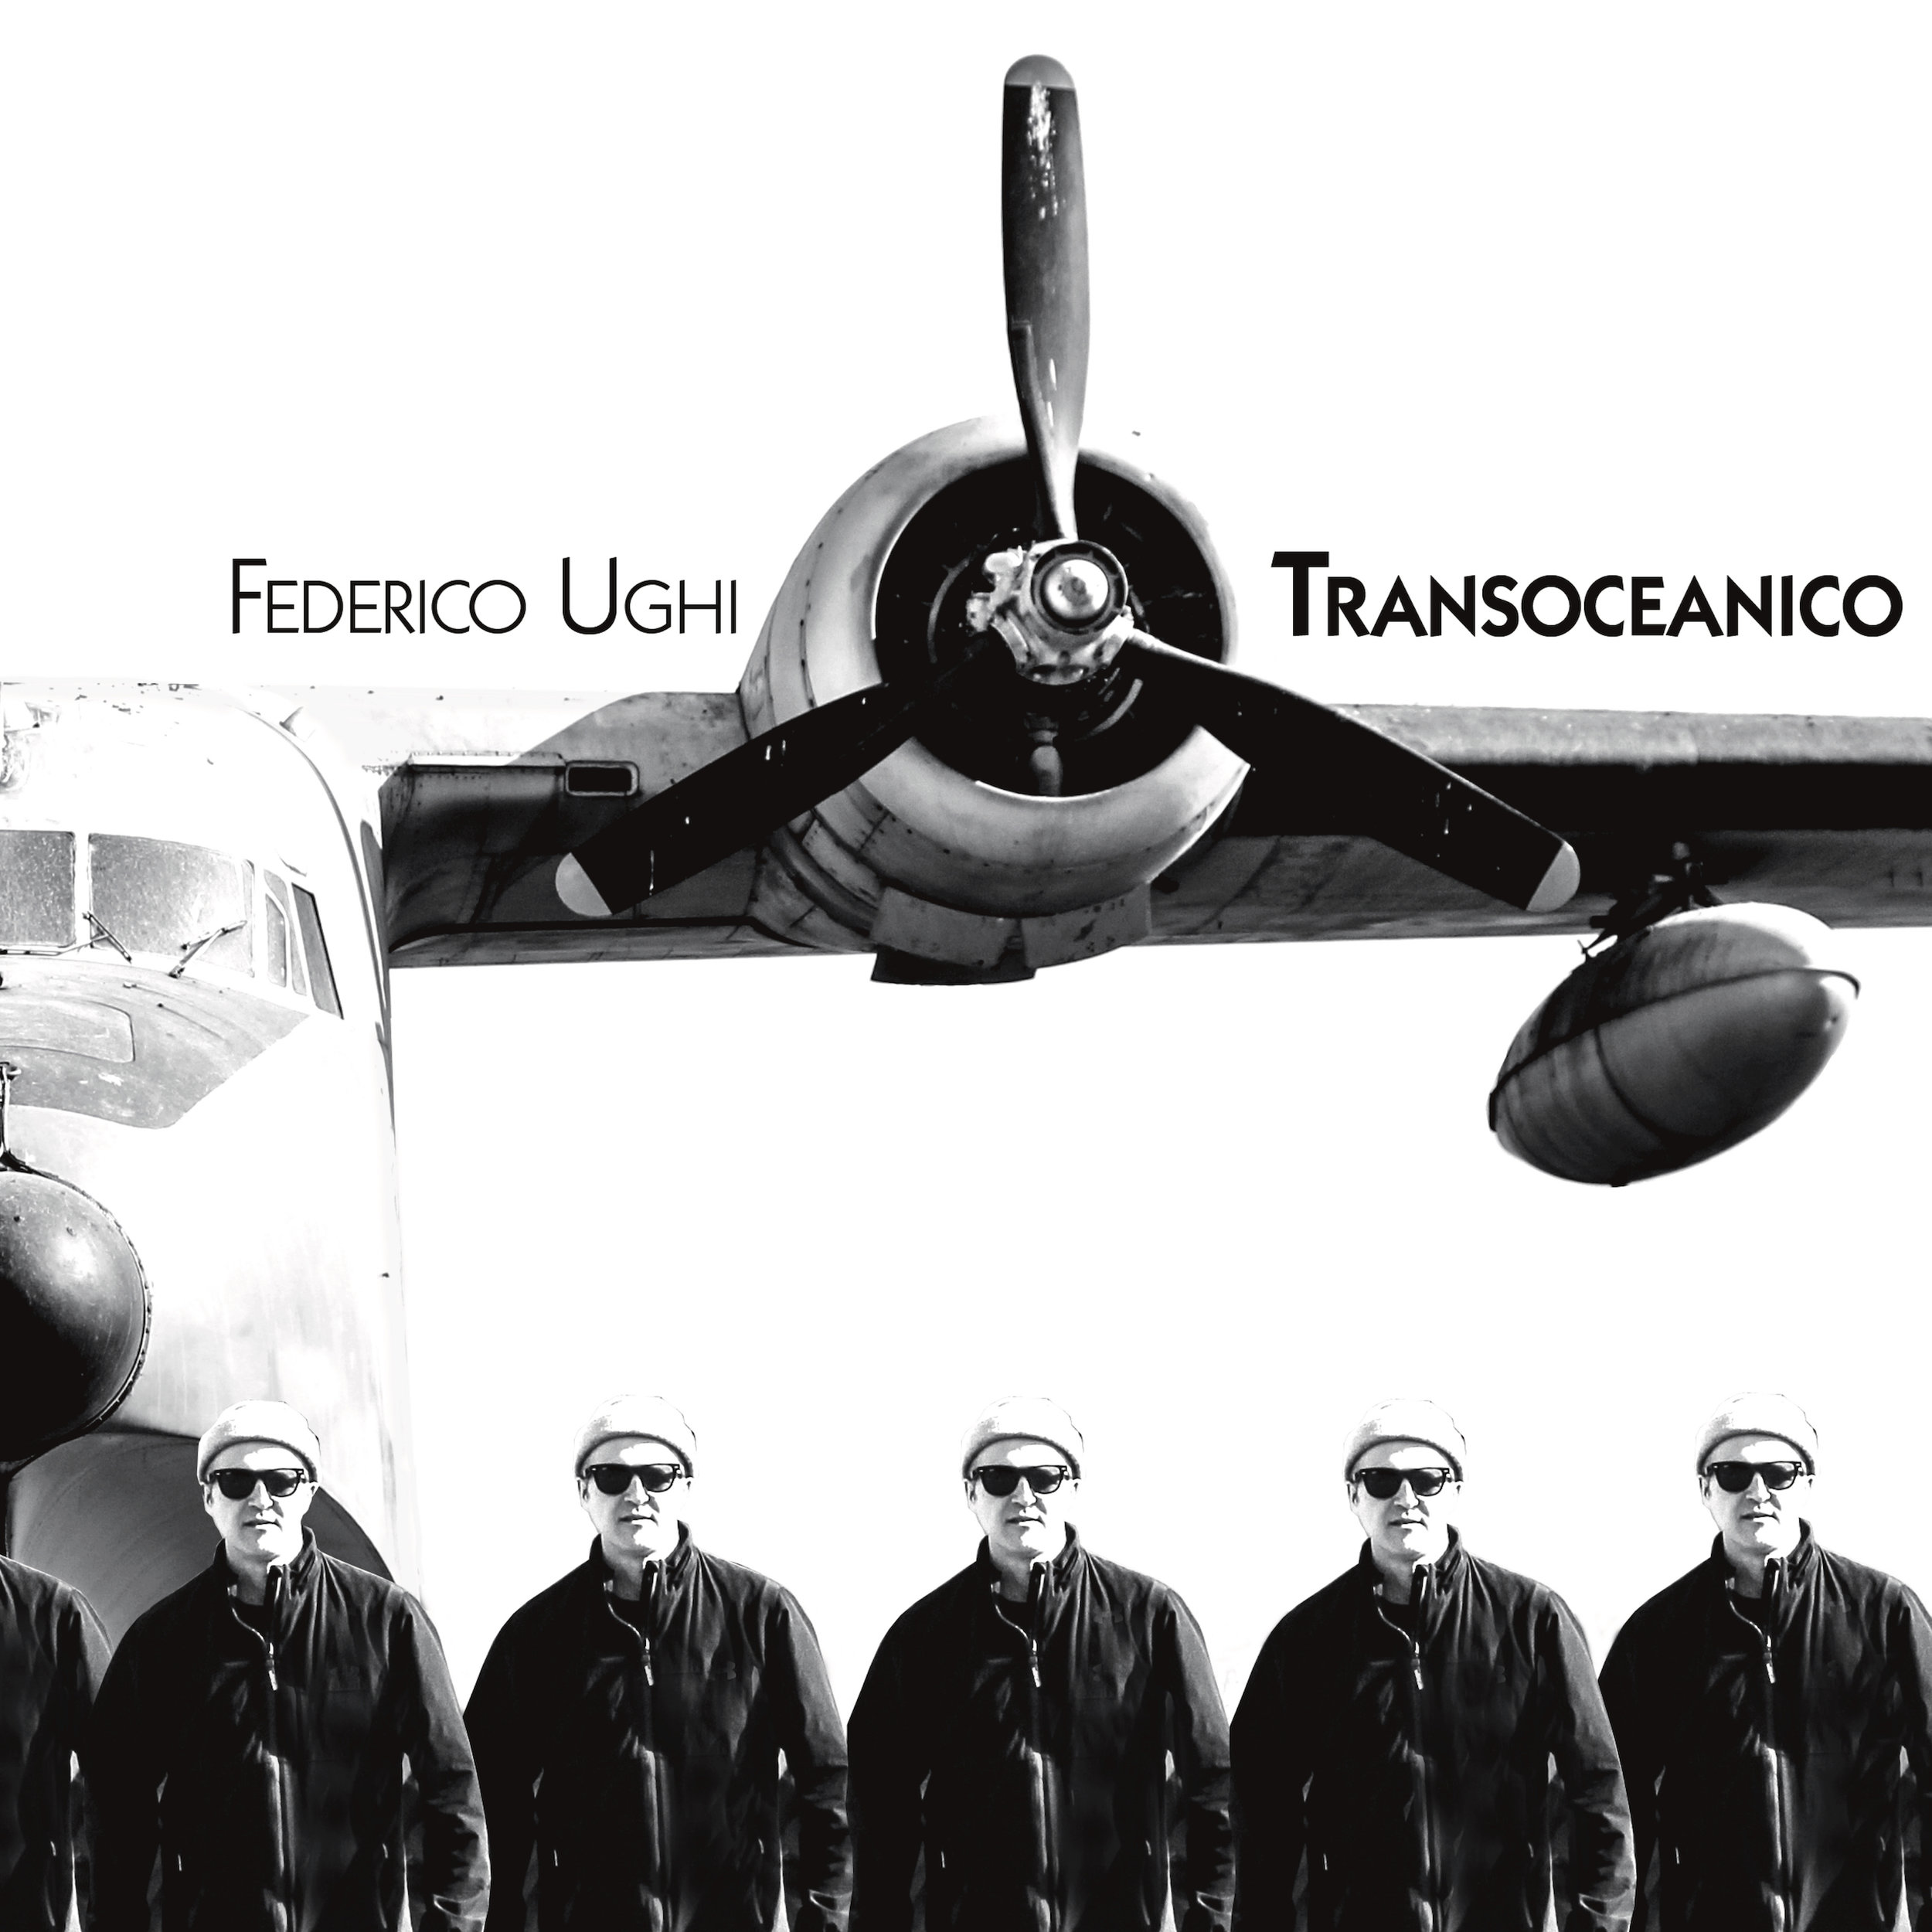 FEDERICO UGHI TRANSOCEANICO feat. RACHEL MUSSON